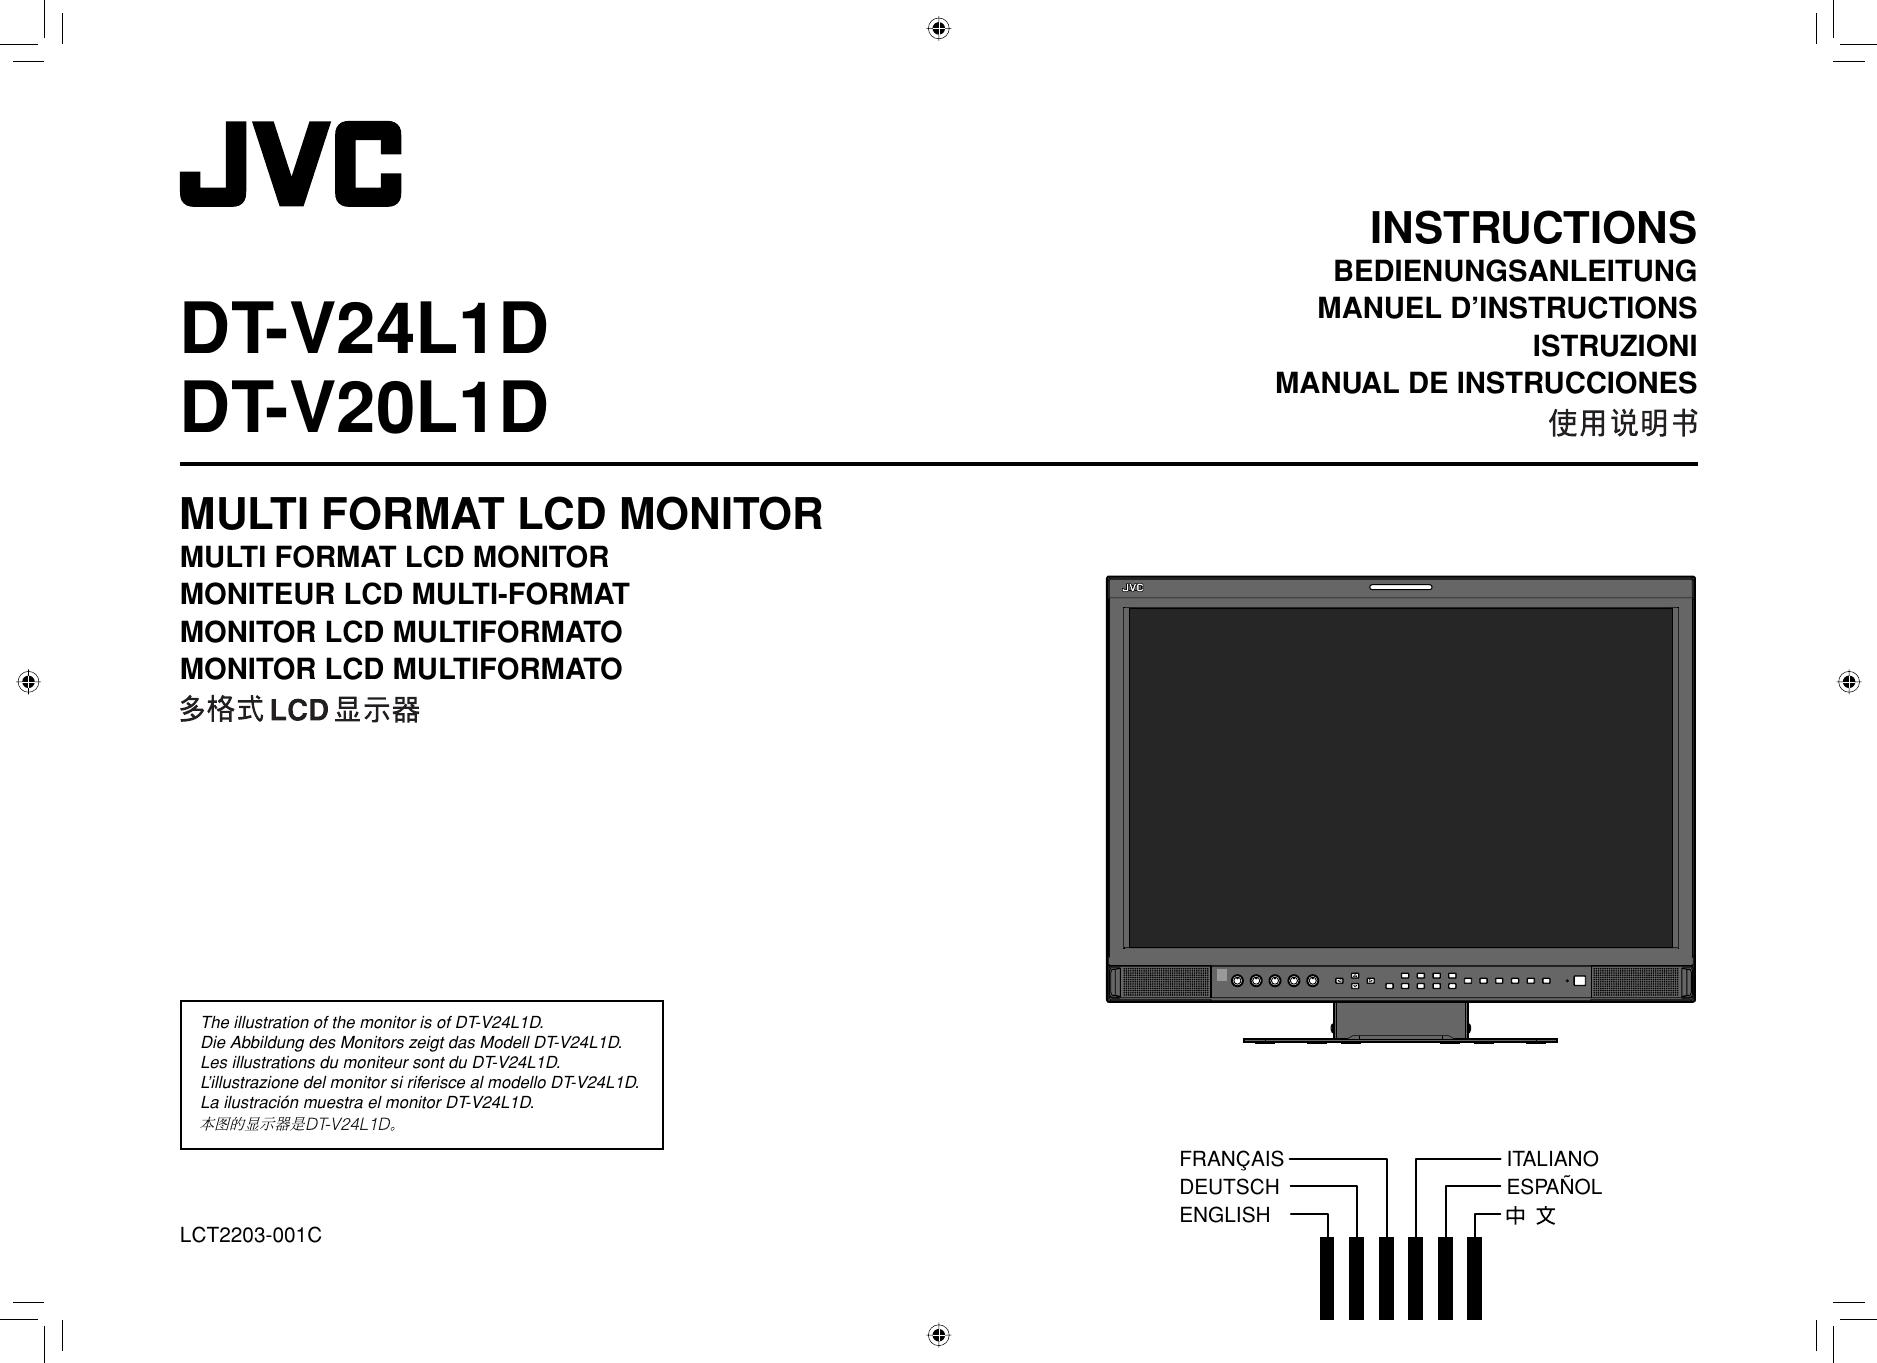 JVC DT V20L1DEA V24L1D/DT V20L1D User Manual V20L1DEA